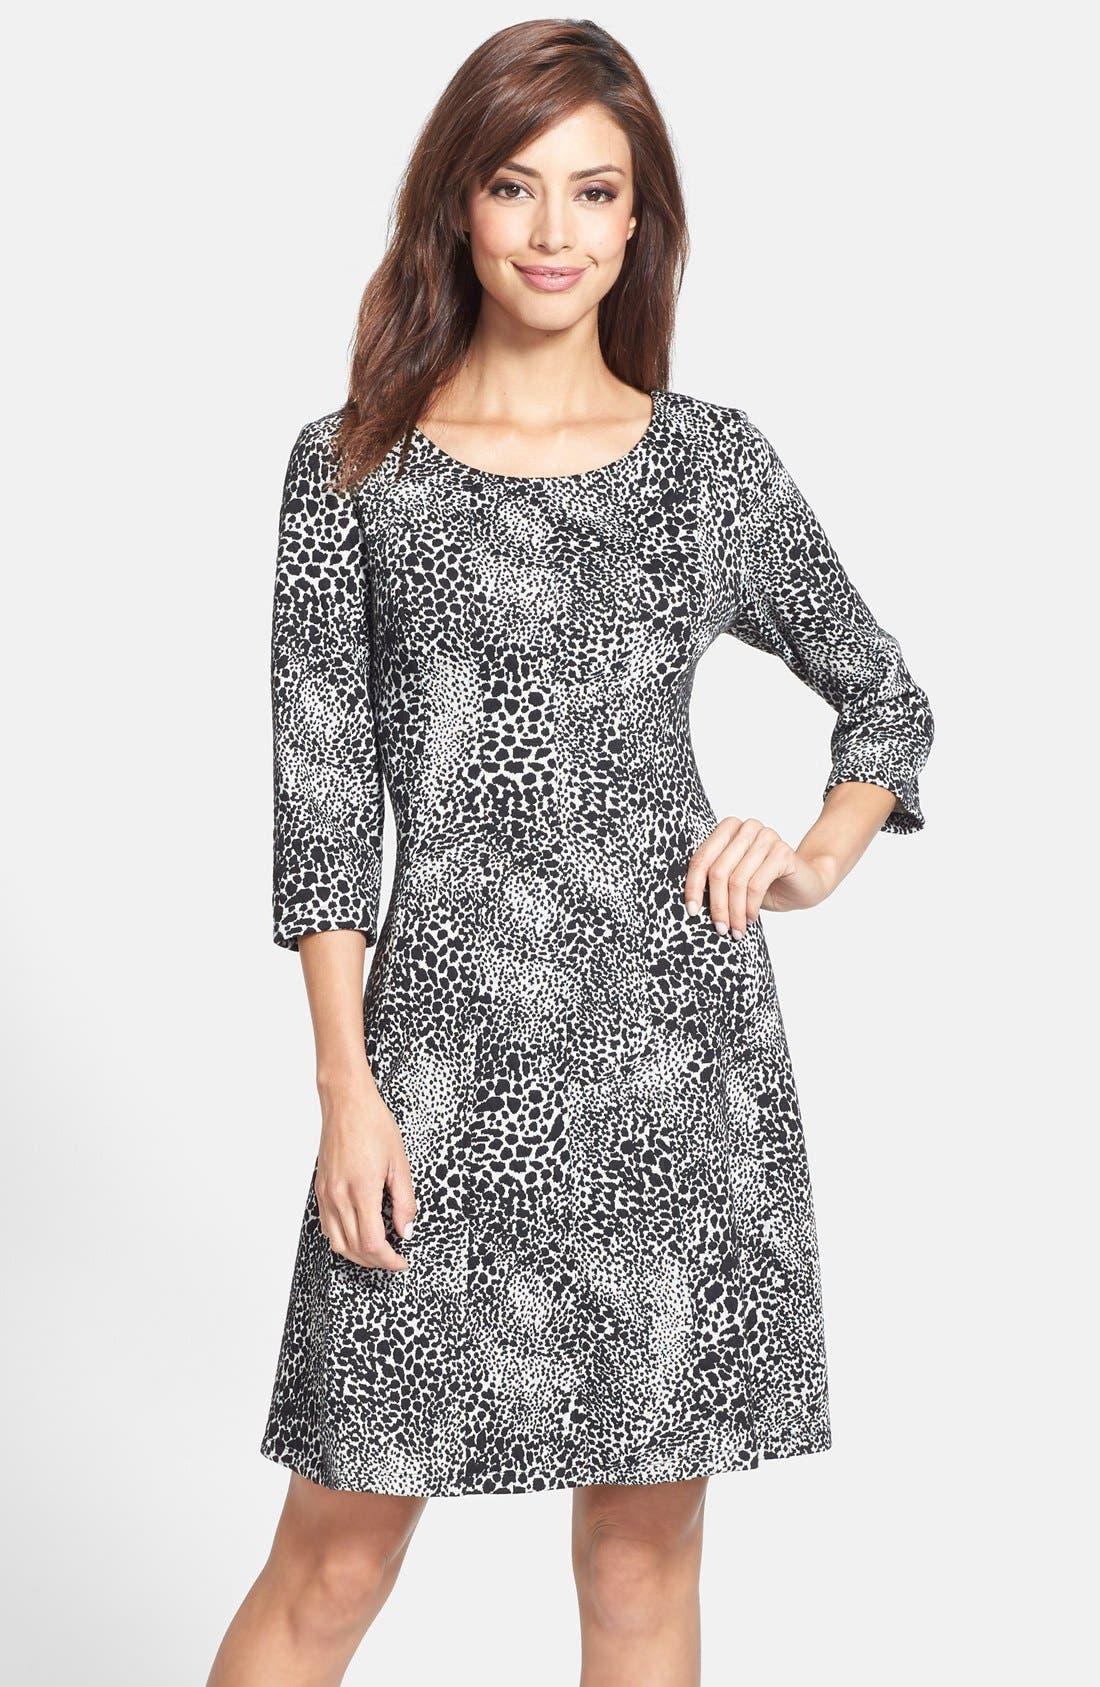 Alternate Image 1 Selected - Taylor Dresses Jacquard Knit Fit & Flare Dress (Regular & Petite)